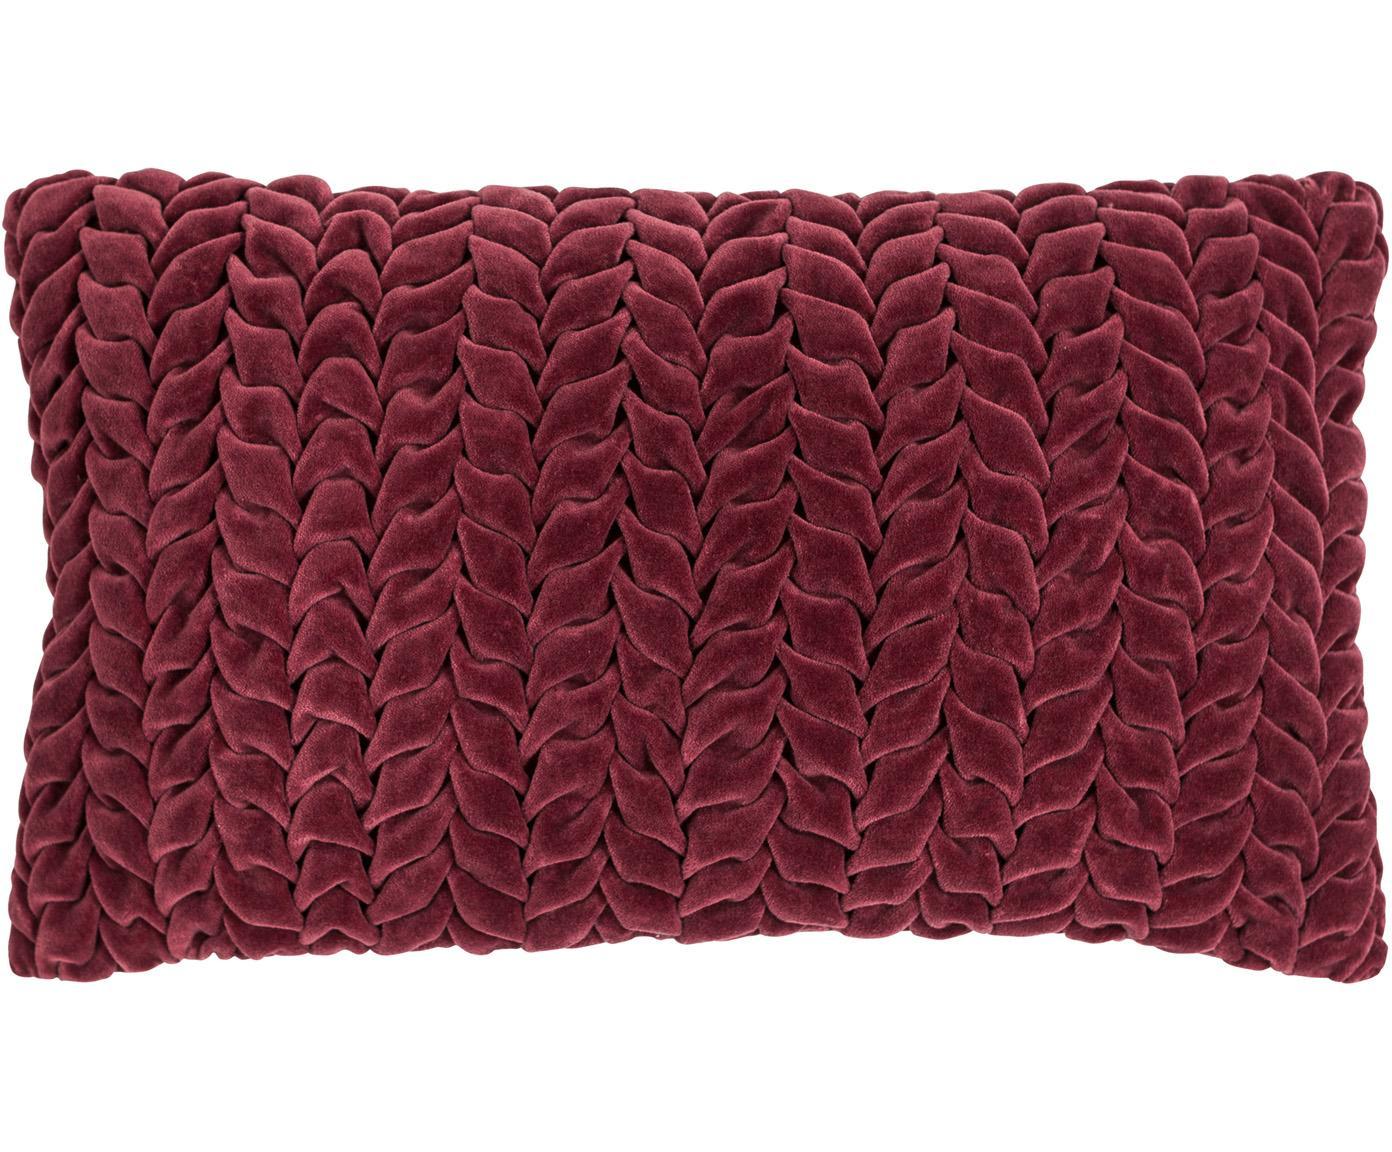 Fluwelen kussen Smock in wijnrood met geribbeld oppervlak, met vulling, Rood, 30 x 50 cm